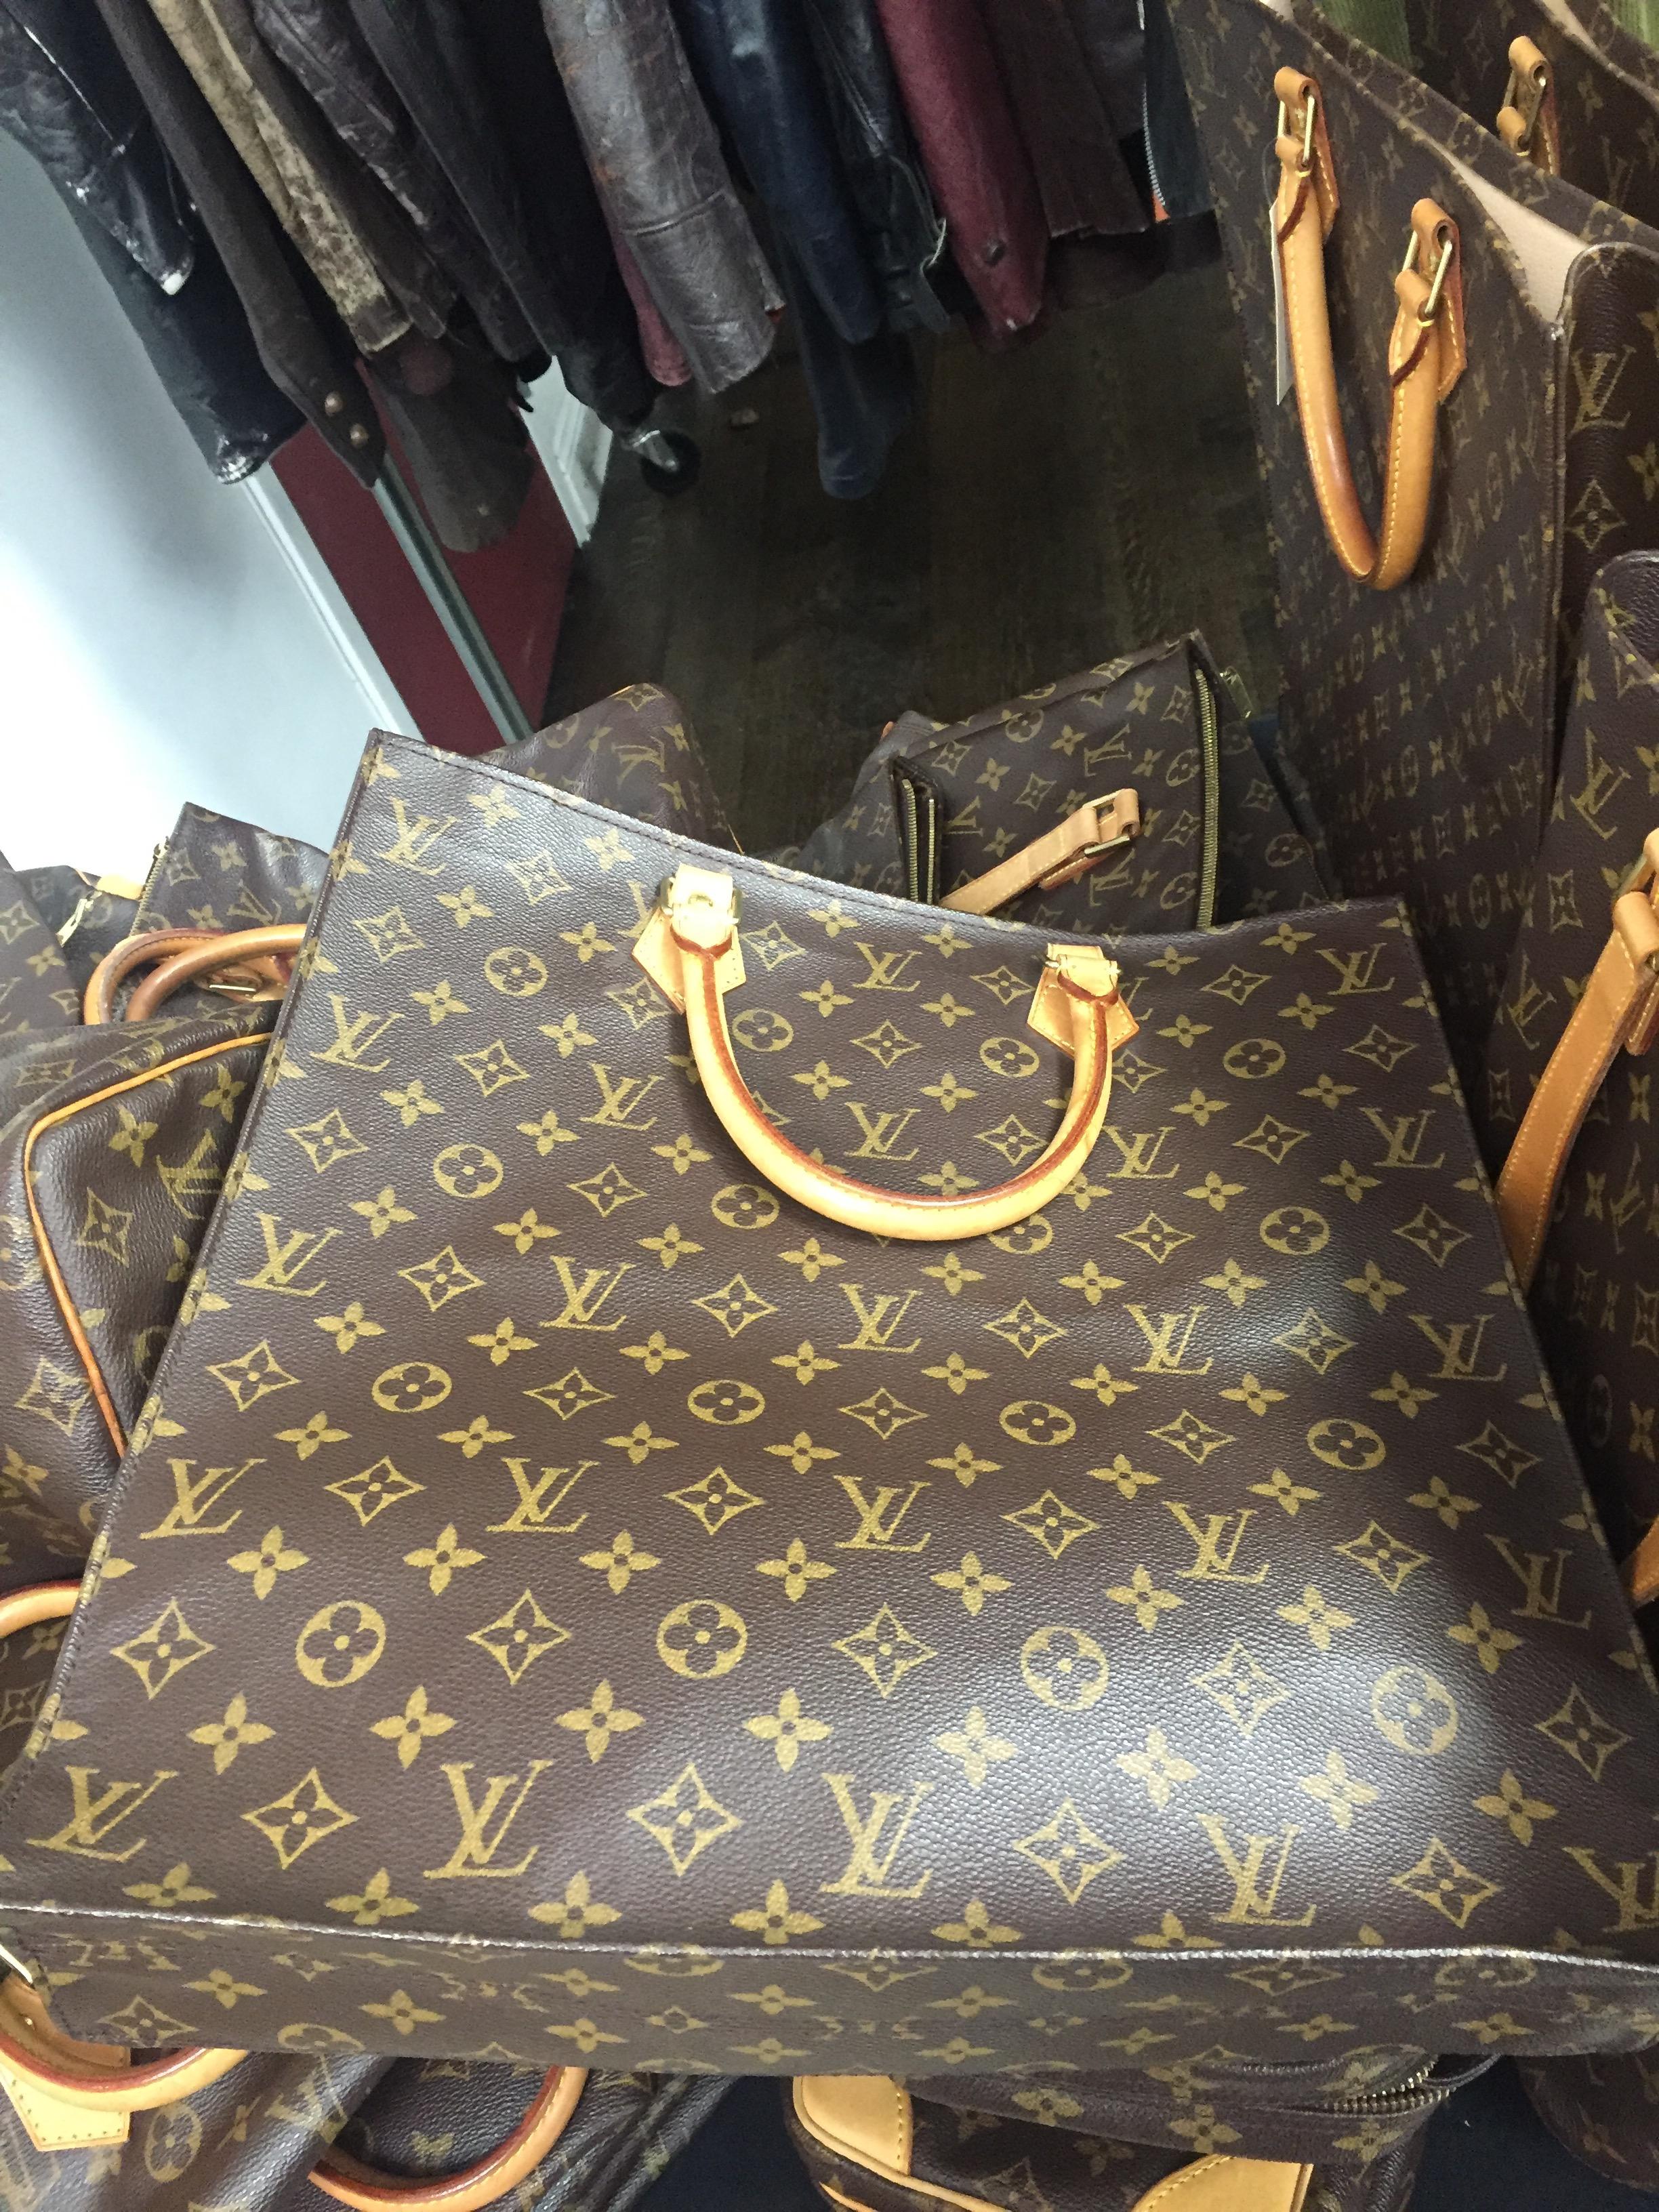 dfee28307f18 Louis Vuitton Bags Start at  450 at This Vintage Sample Sale Slash ...